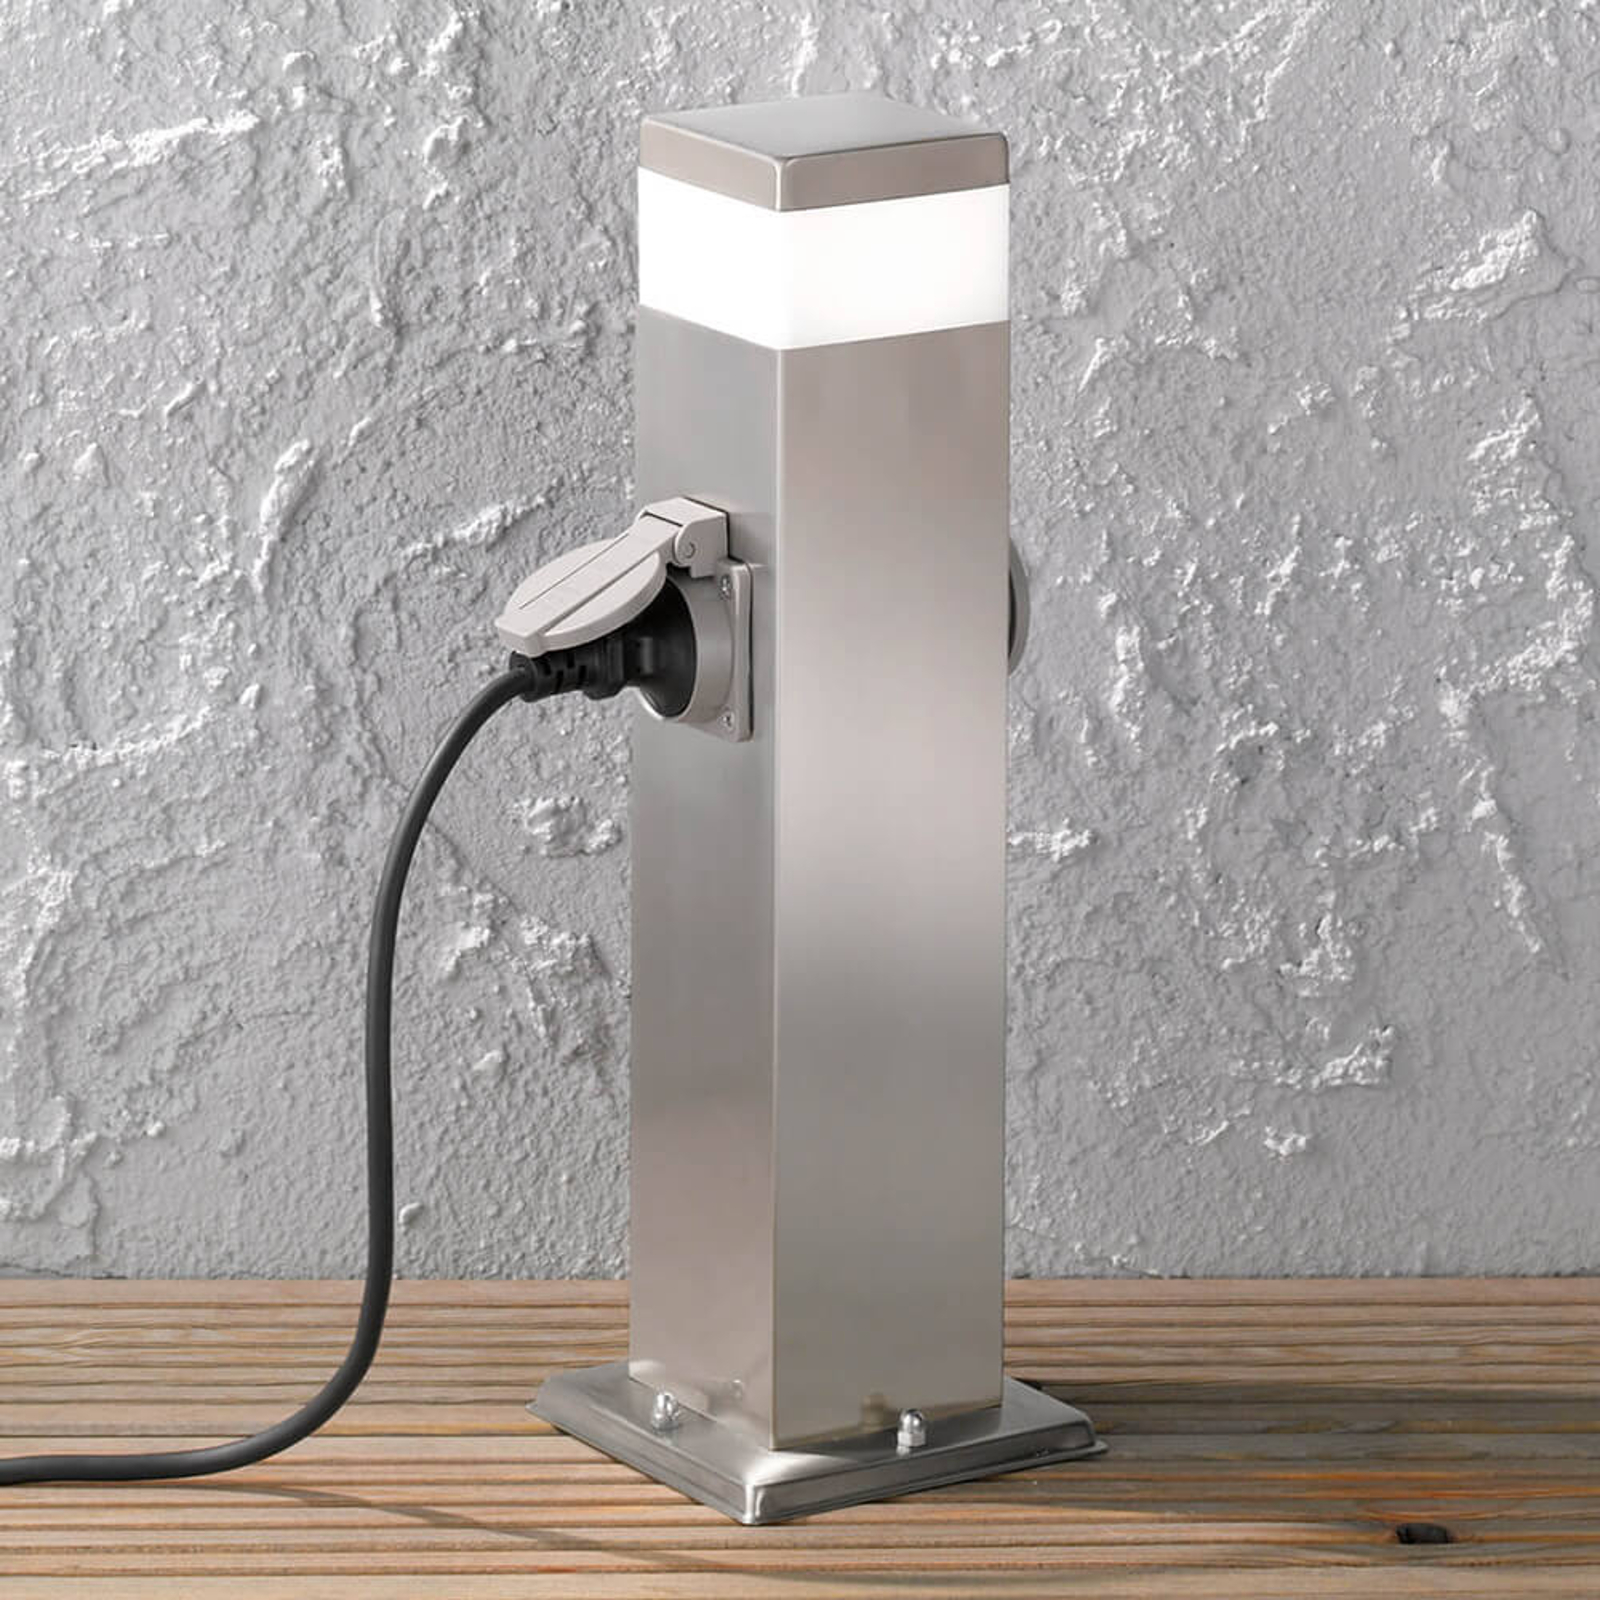 2er Steckdosensäule Tara mit LED-Beleuchtung